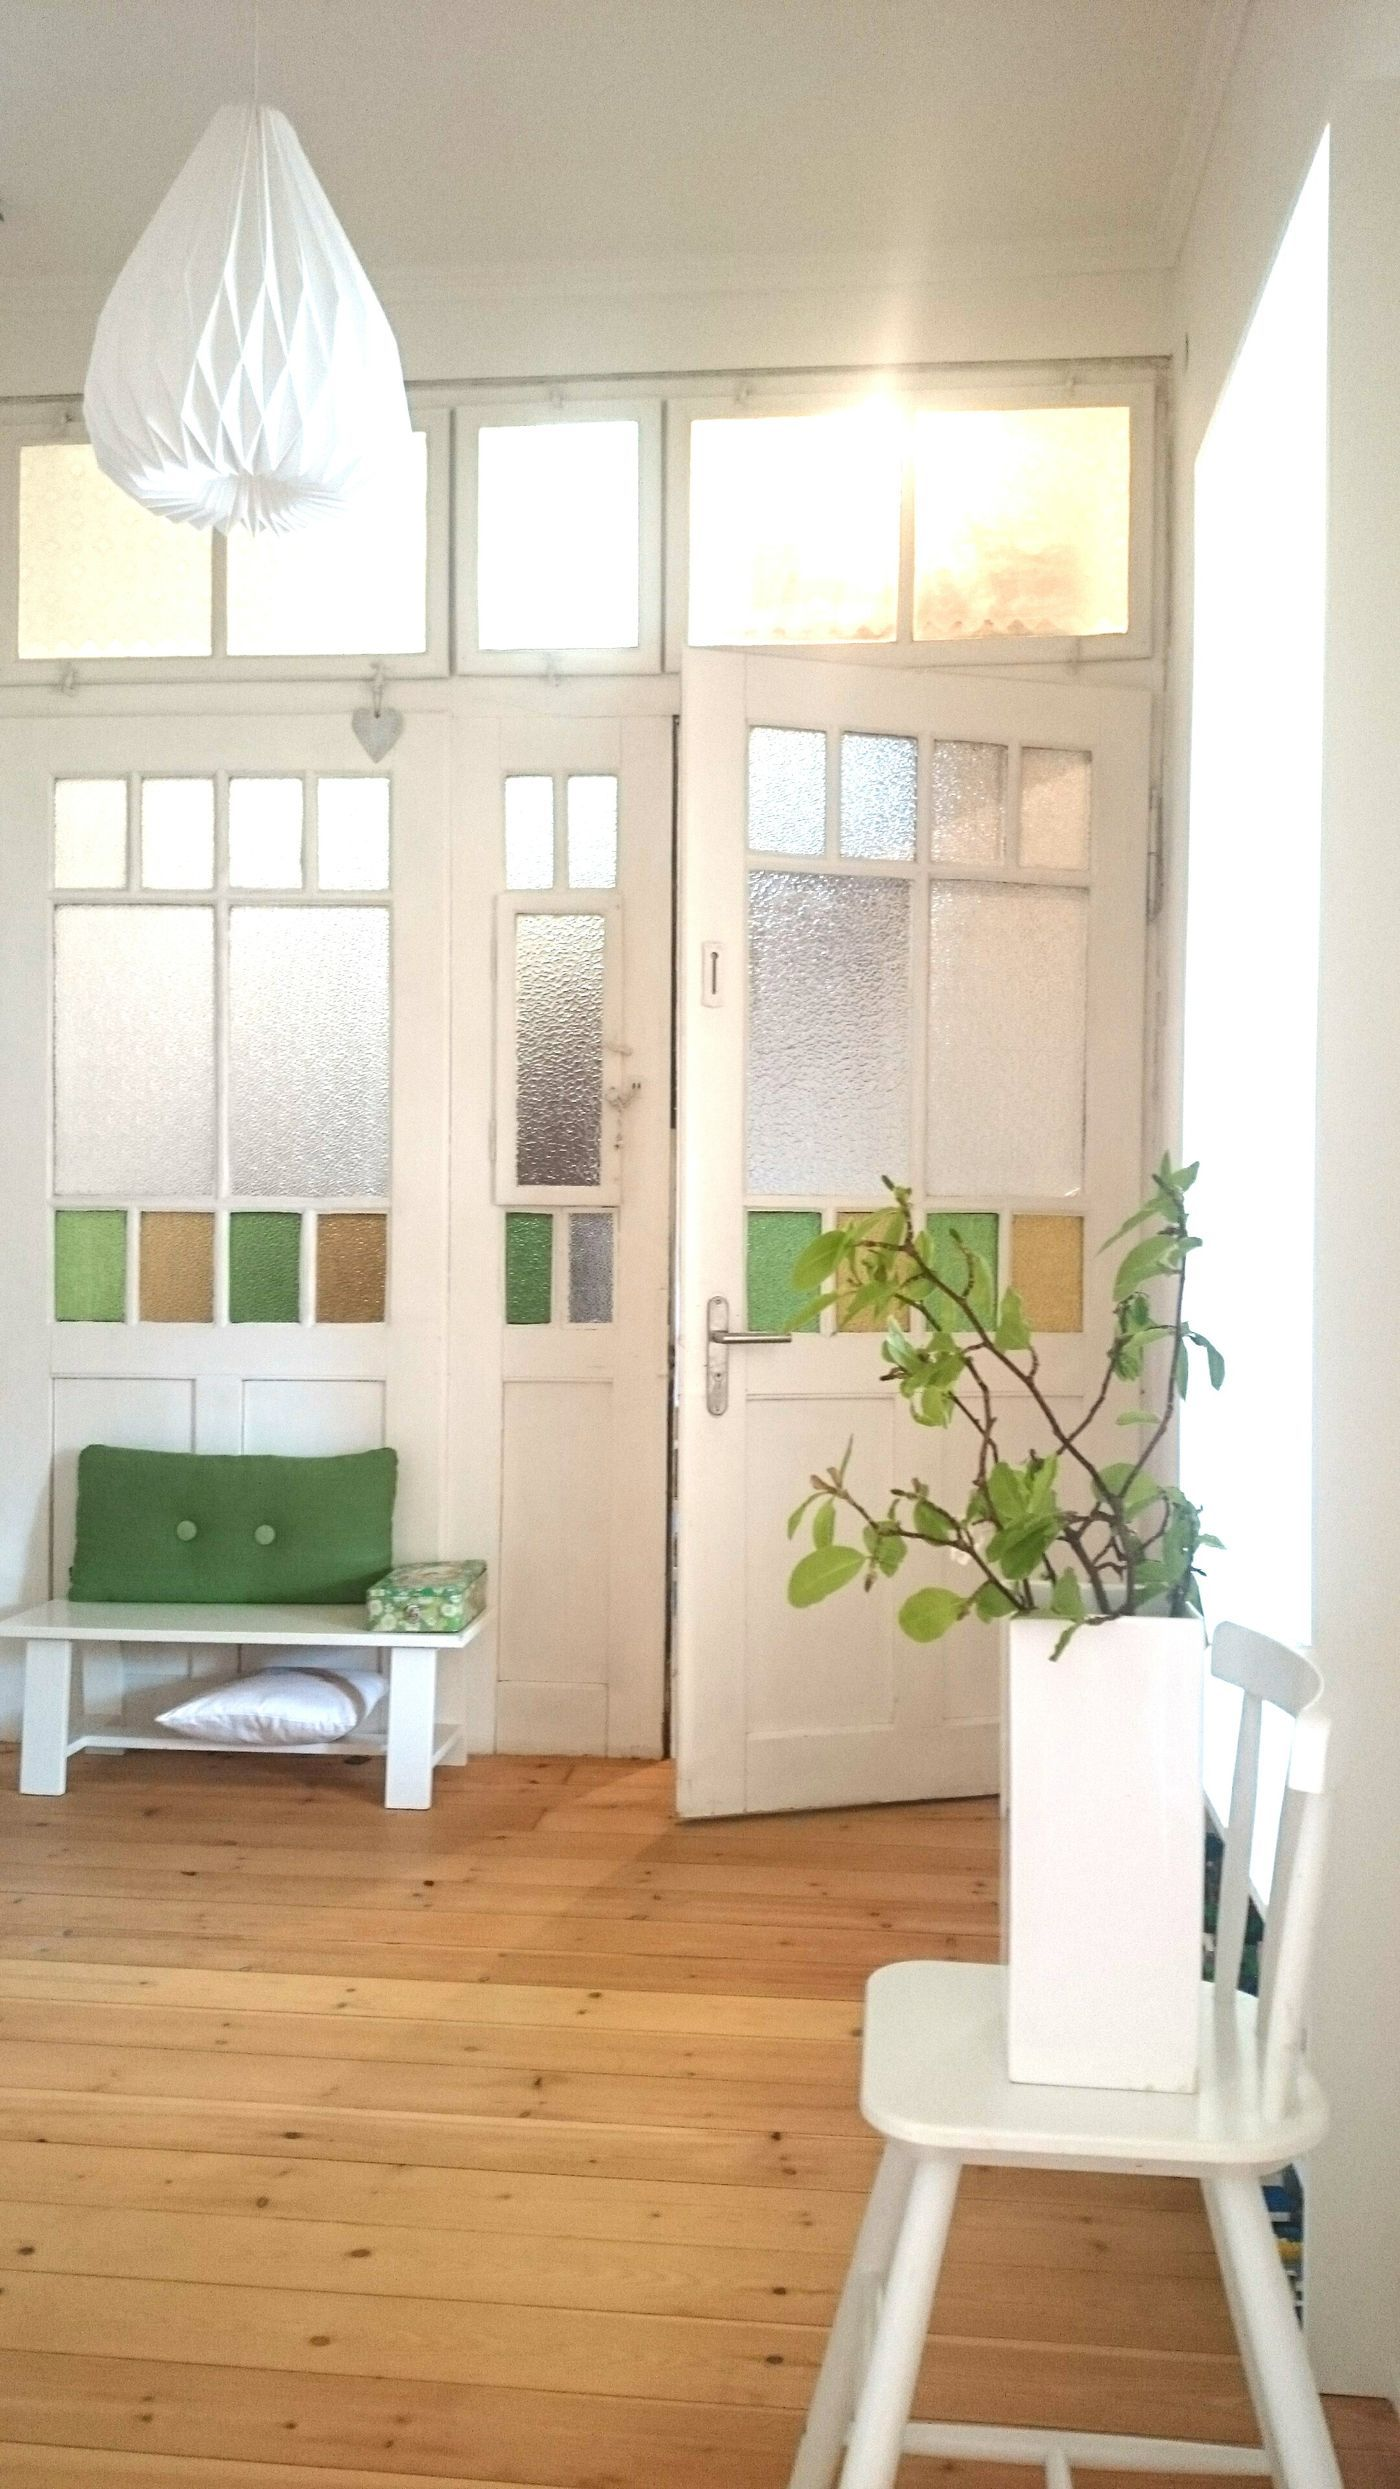 flur tapeten ideen full size of tapeten flur gestaltung bilder treppenhaus gestalten auf ideen. Black Bedroom Furniture Sets. Home Design Ideas